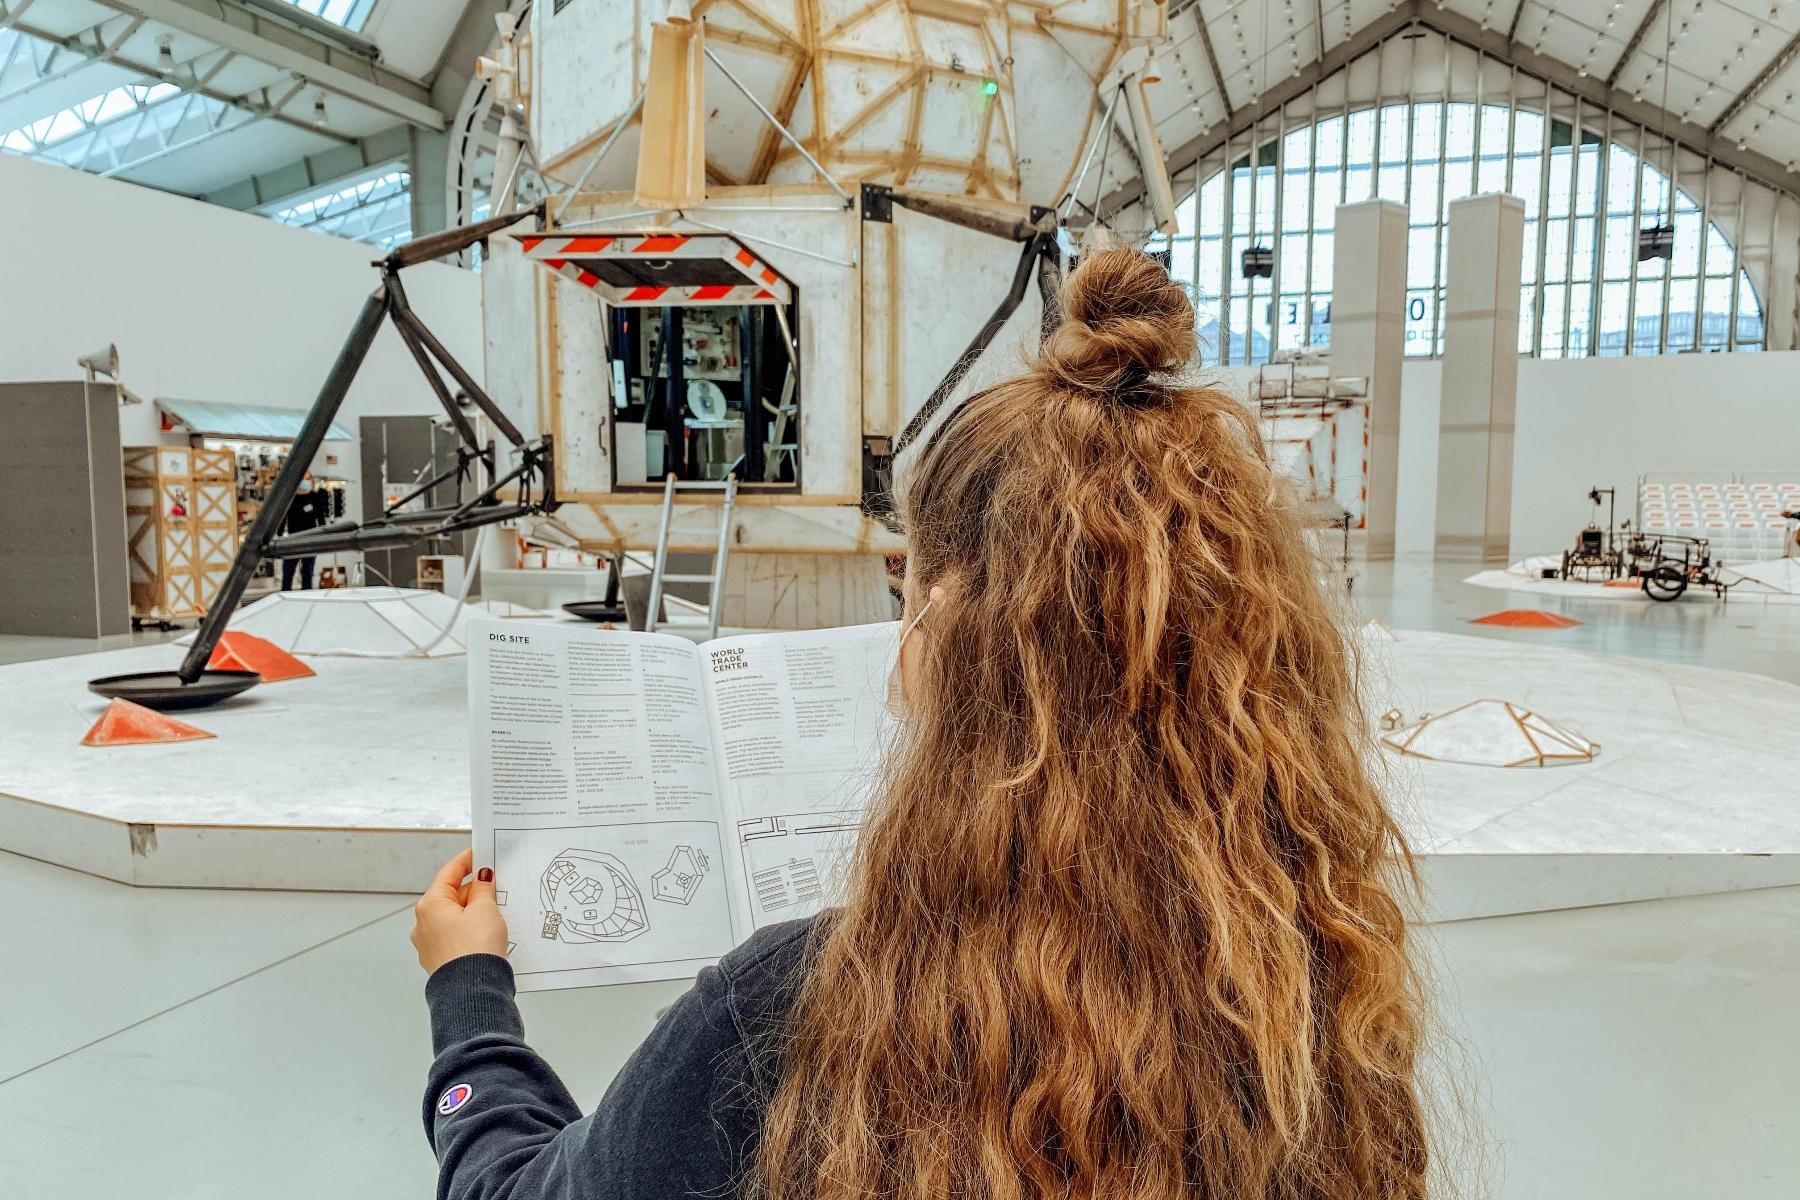 Geheimtipp Hamburg Kunst & Kultur Ausstellung Tom Sachs Space Program Lilli Sprung Sophie Stögmüller 15